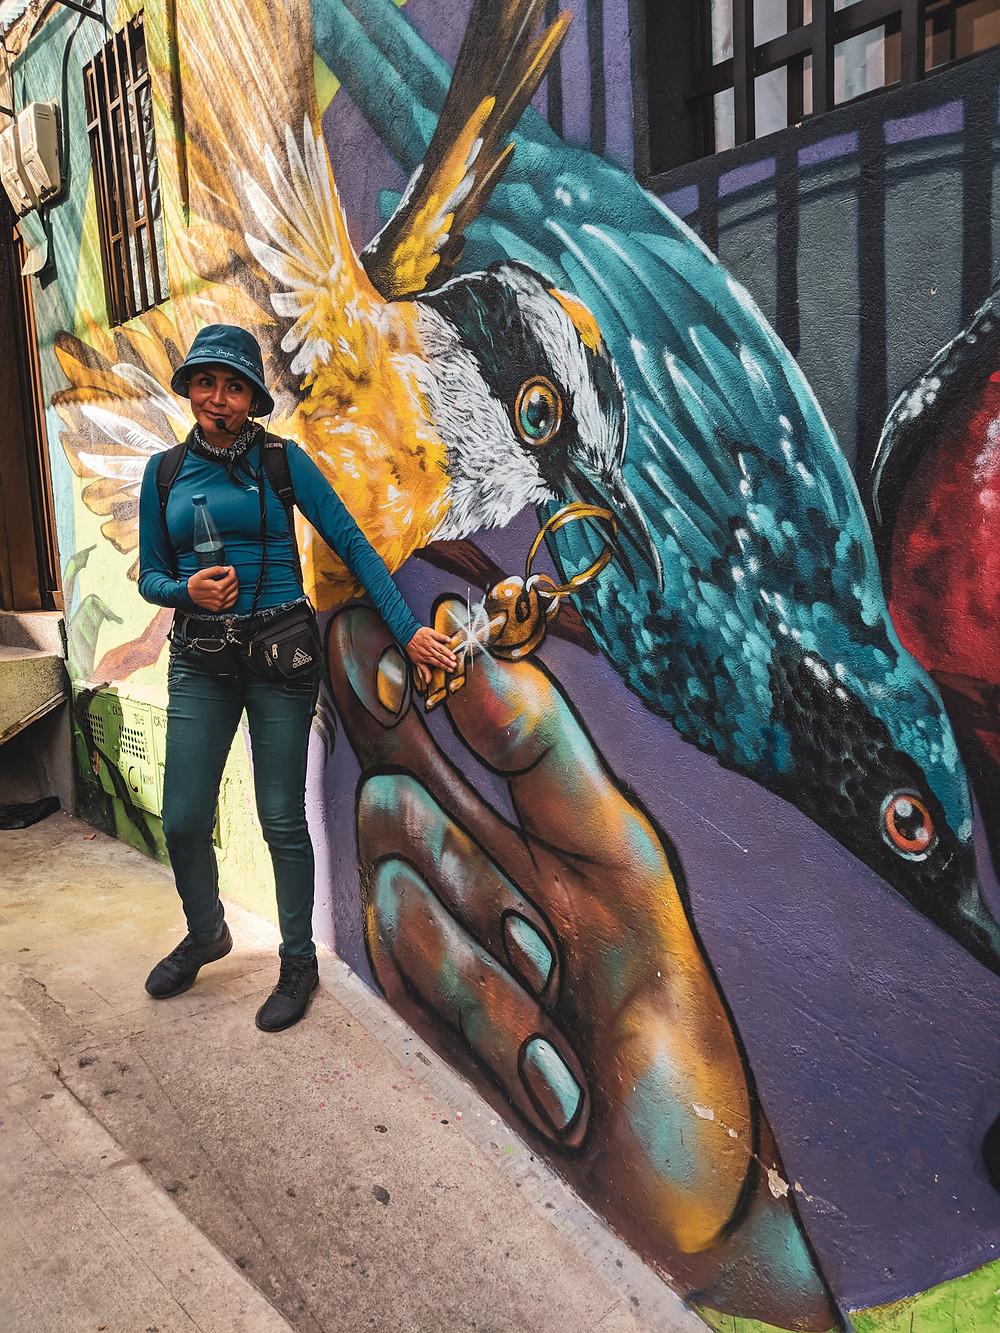 Guide explaining graffiti murals in Comuna 13 in Medellín, Colombia.